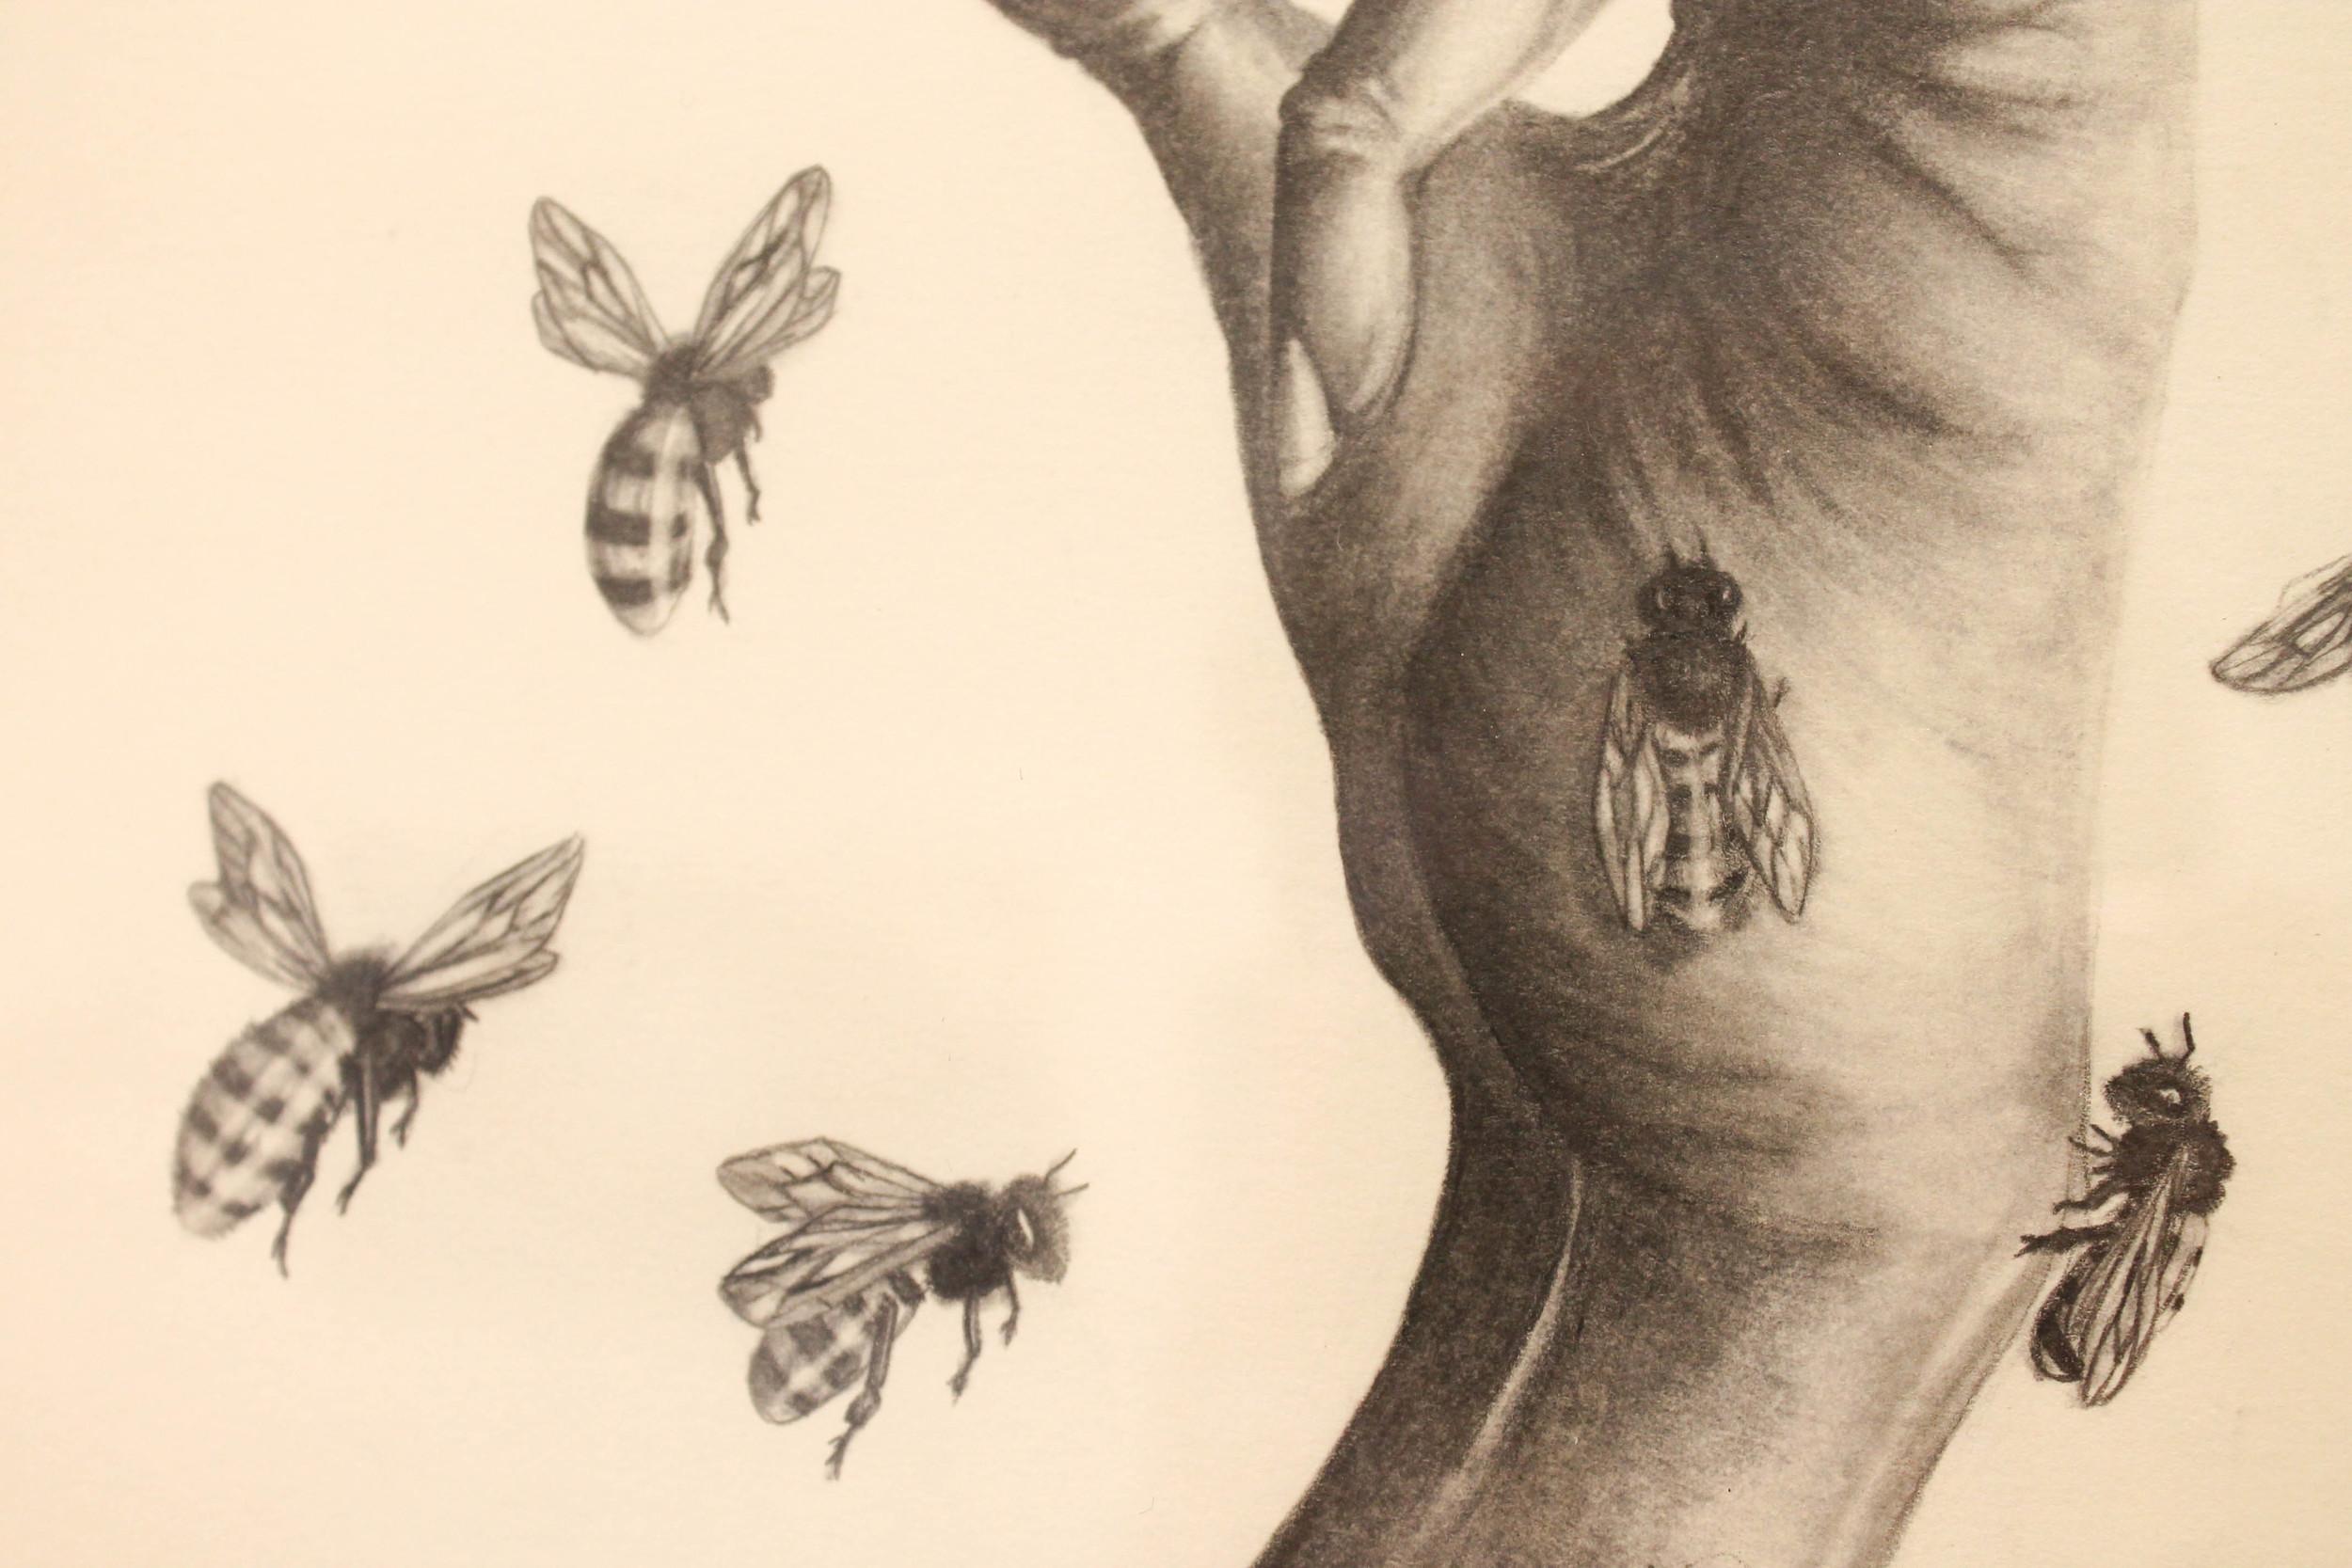 Susannah Kelly, 'Swarm' (detail)